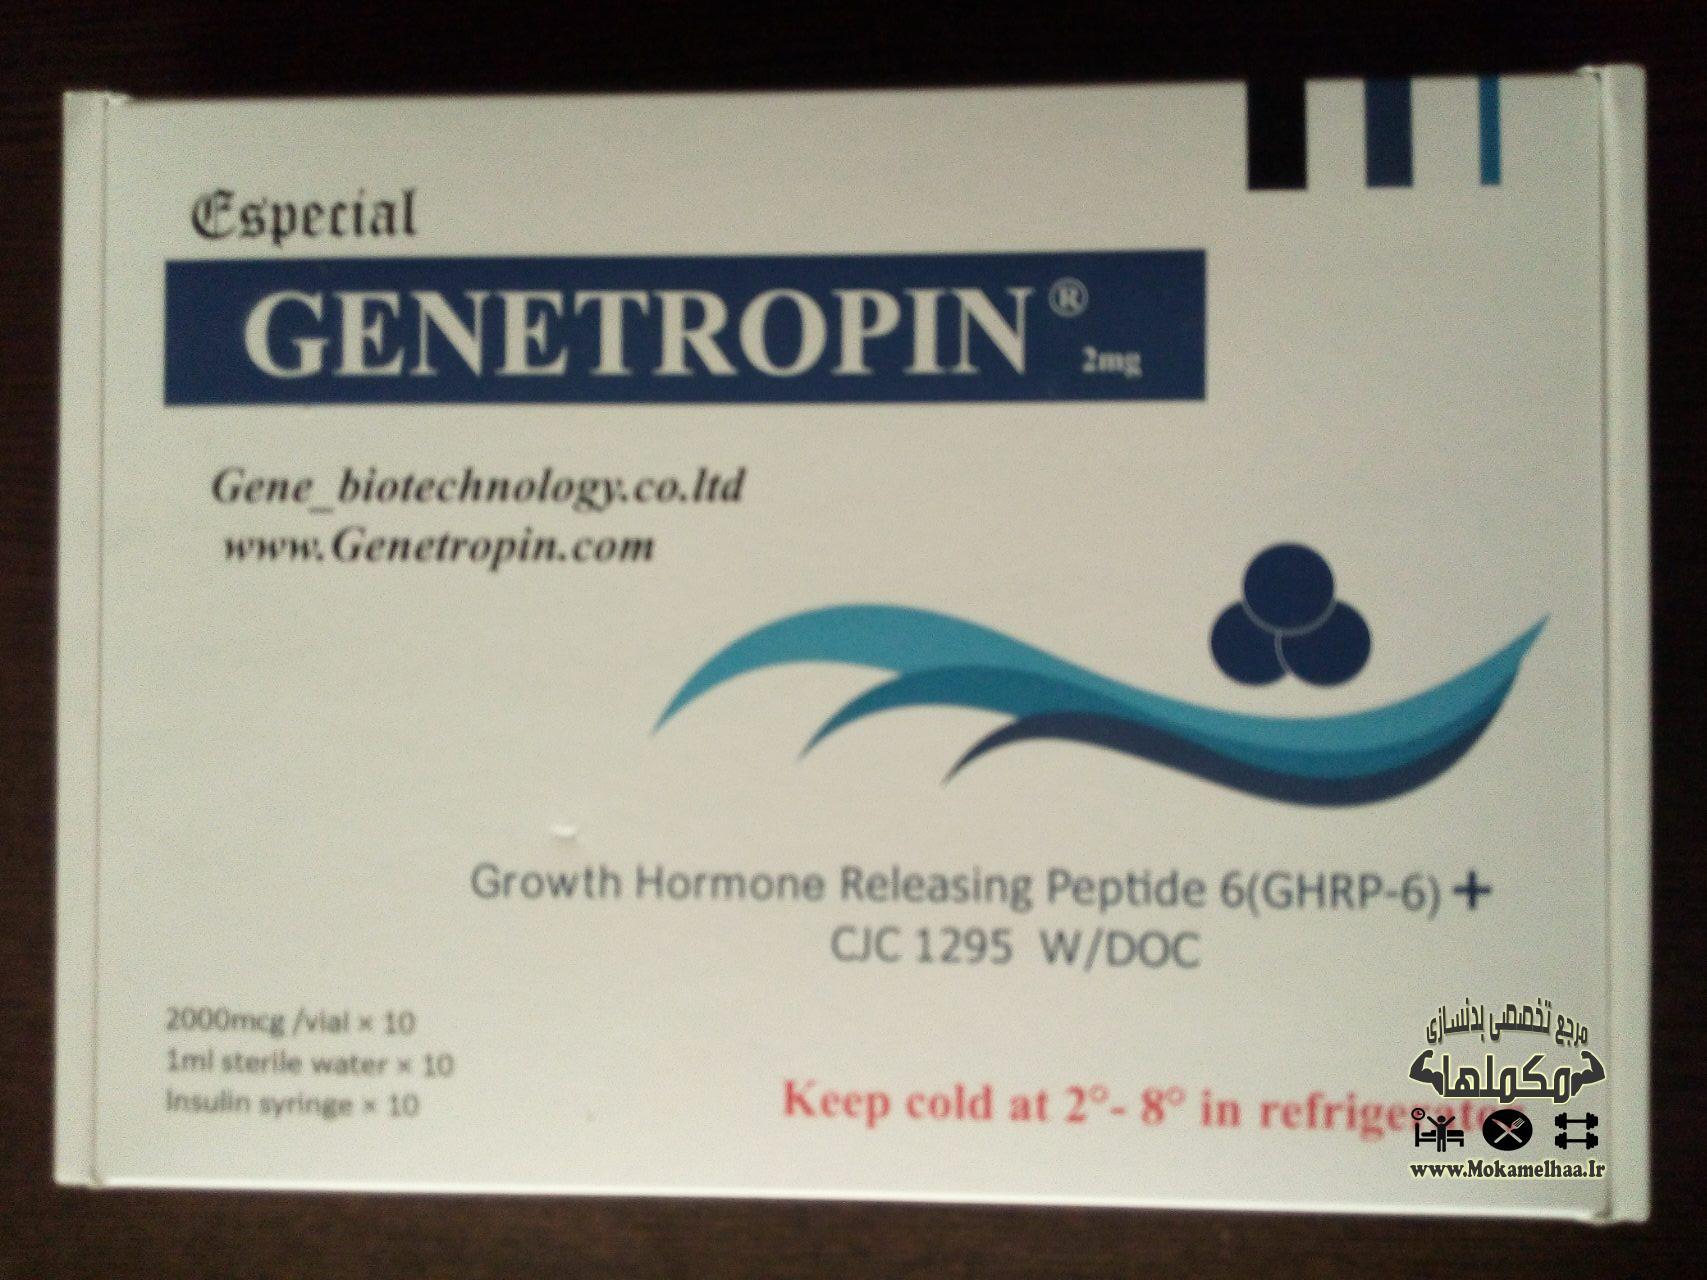 cjc1295+ghrp6 genetropin